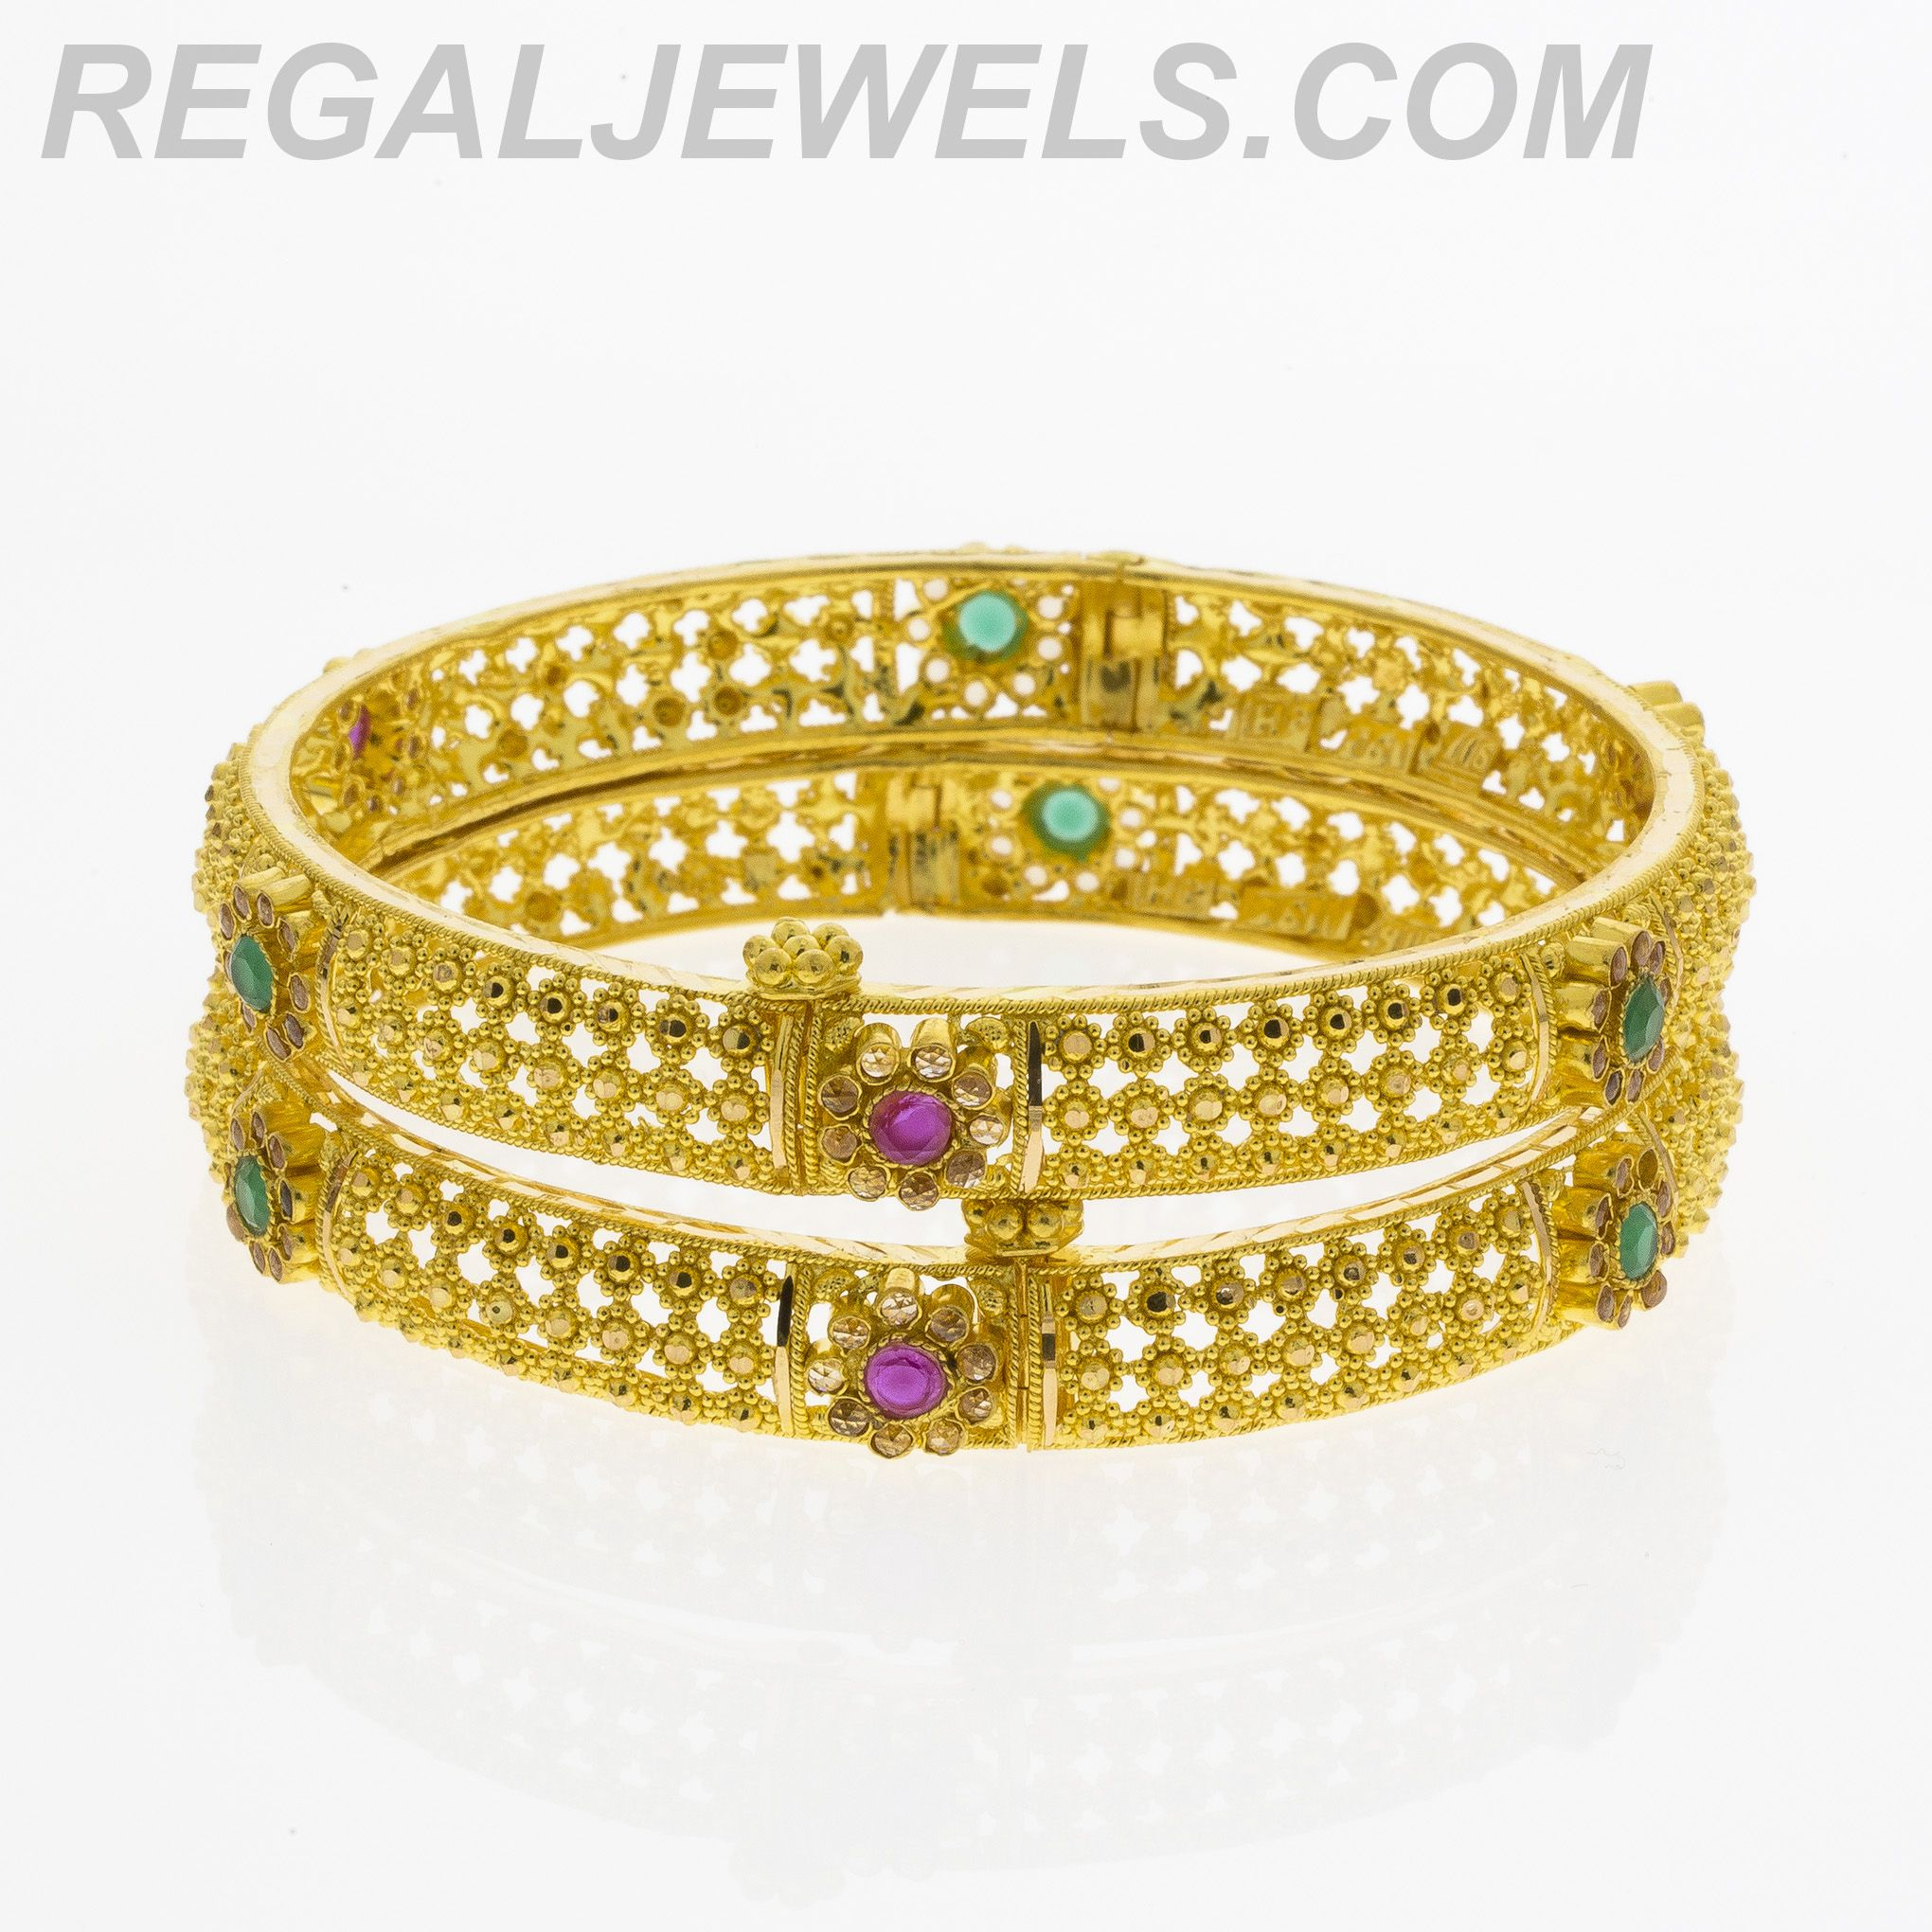 Regal Jewels line 22KT Gold Filigree Multicolored Crystal